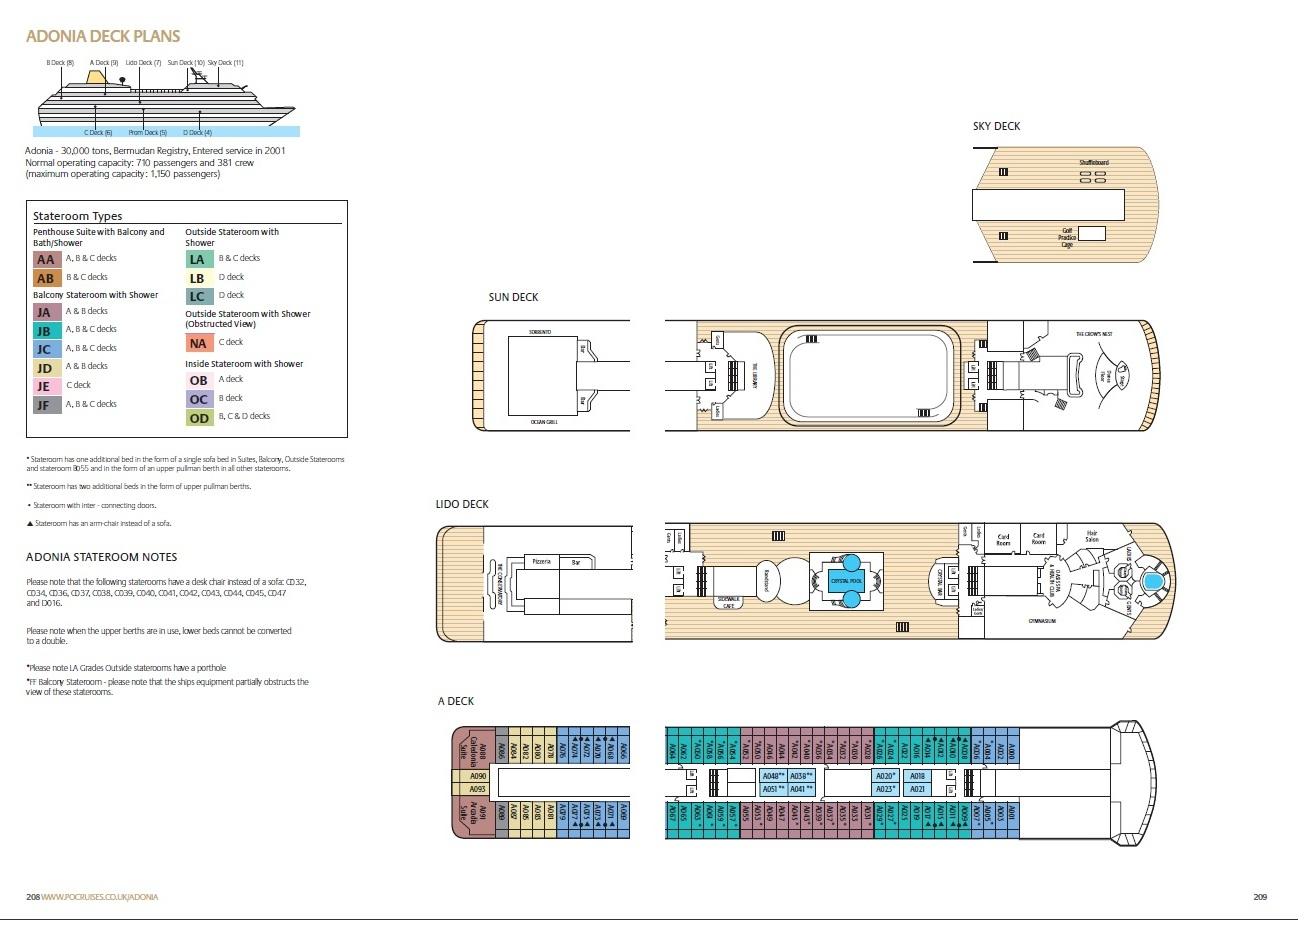 Po cruises adonia deck plans baanklon Image collections